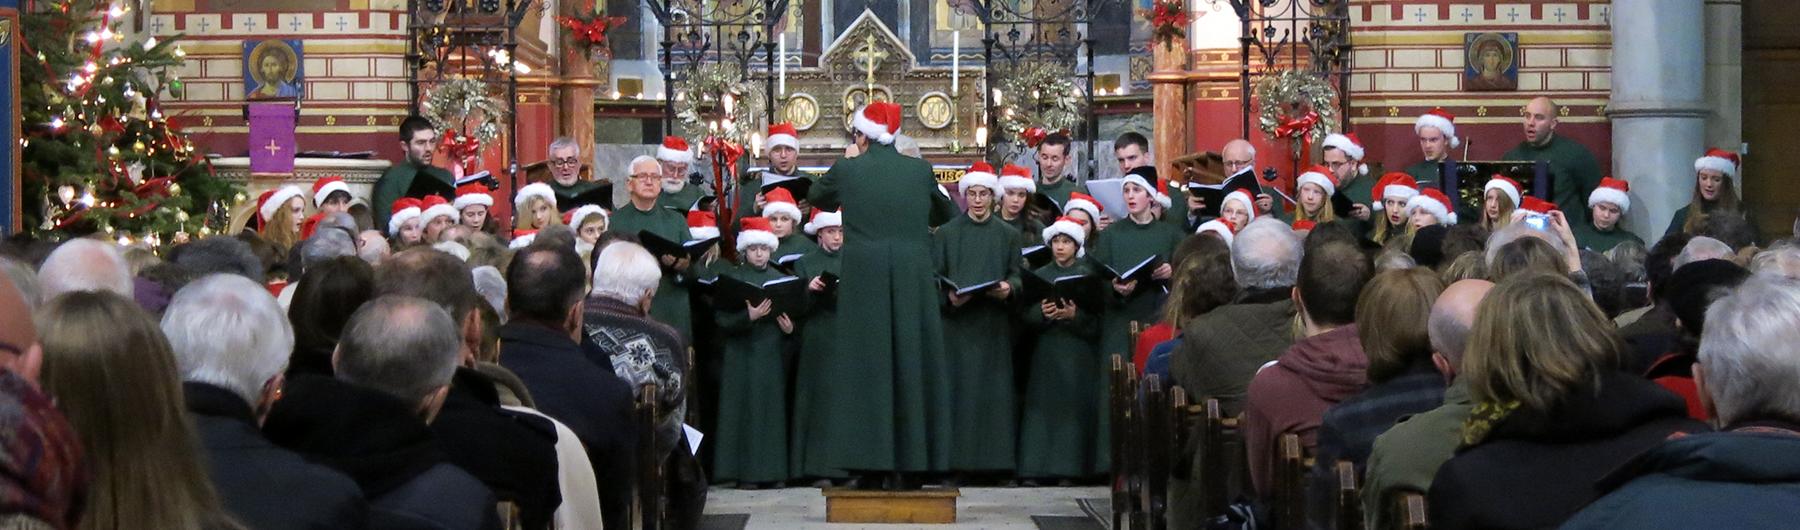 Carols and Festive Readings (15 December)